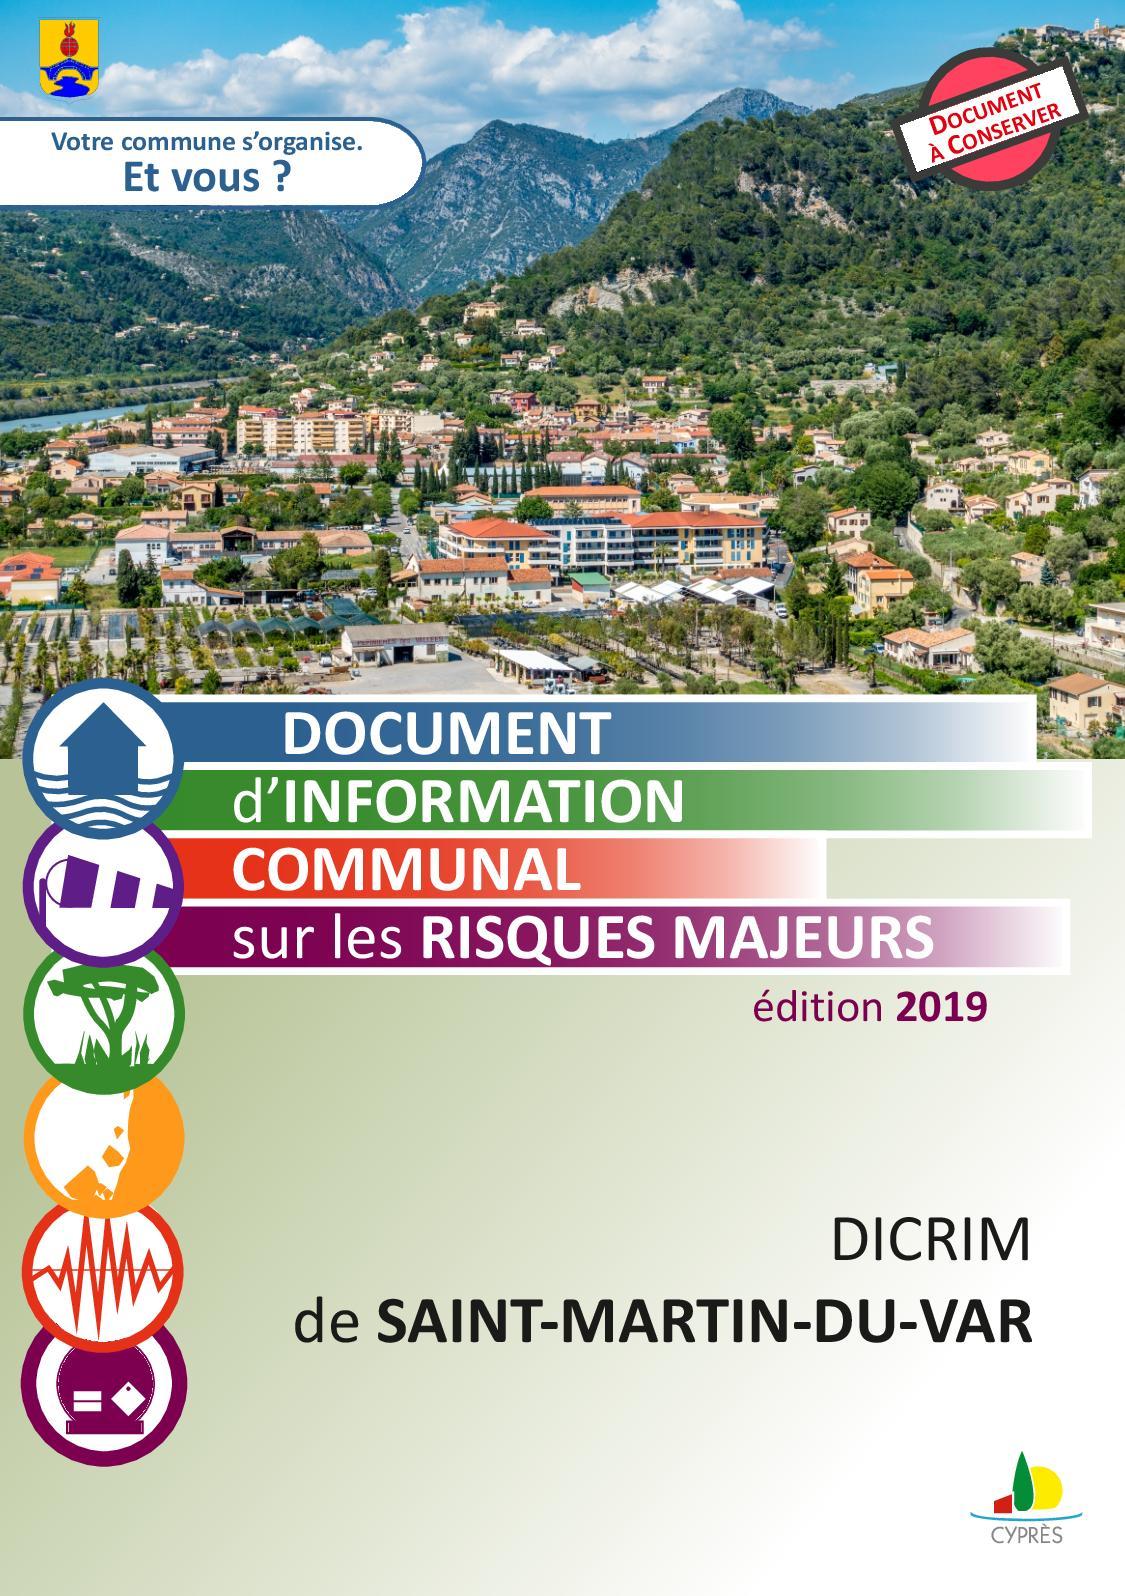 DICRIM de Saint-Martin-du-Var (06)